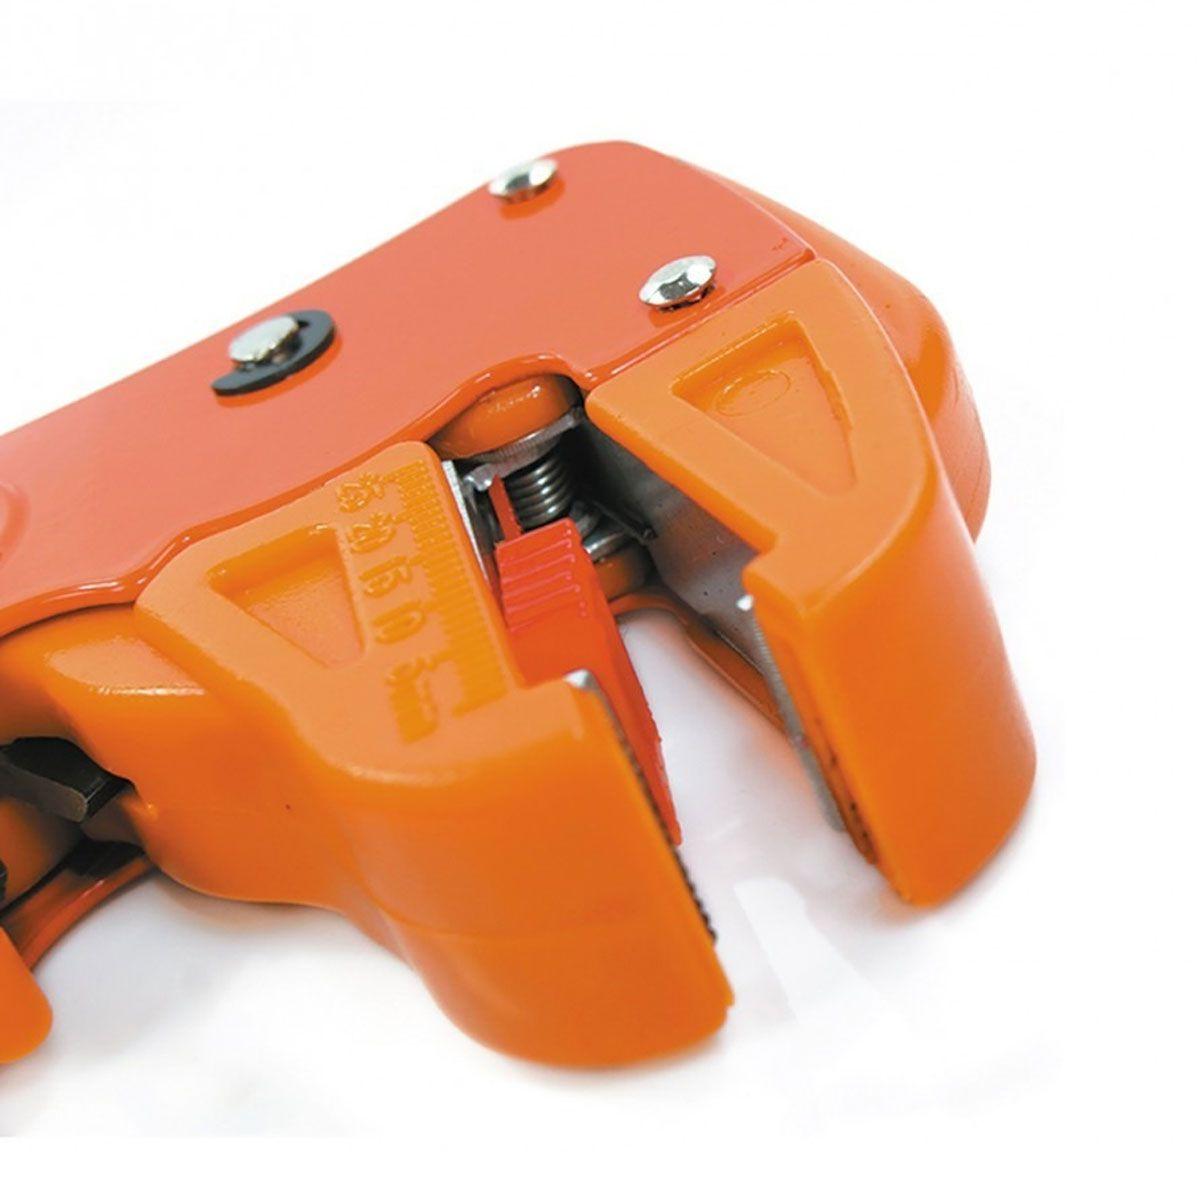 Alicate Decapador Cortador de Fios 0,2 a 6mm² HK-310 - Hikari